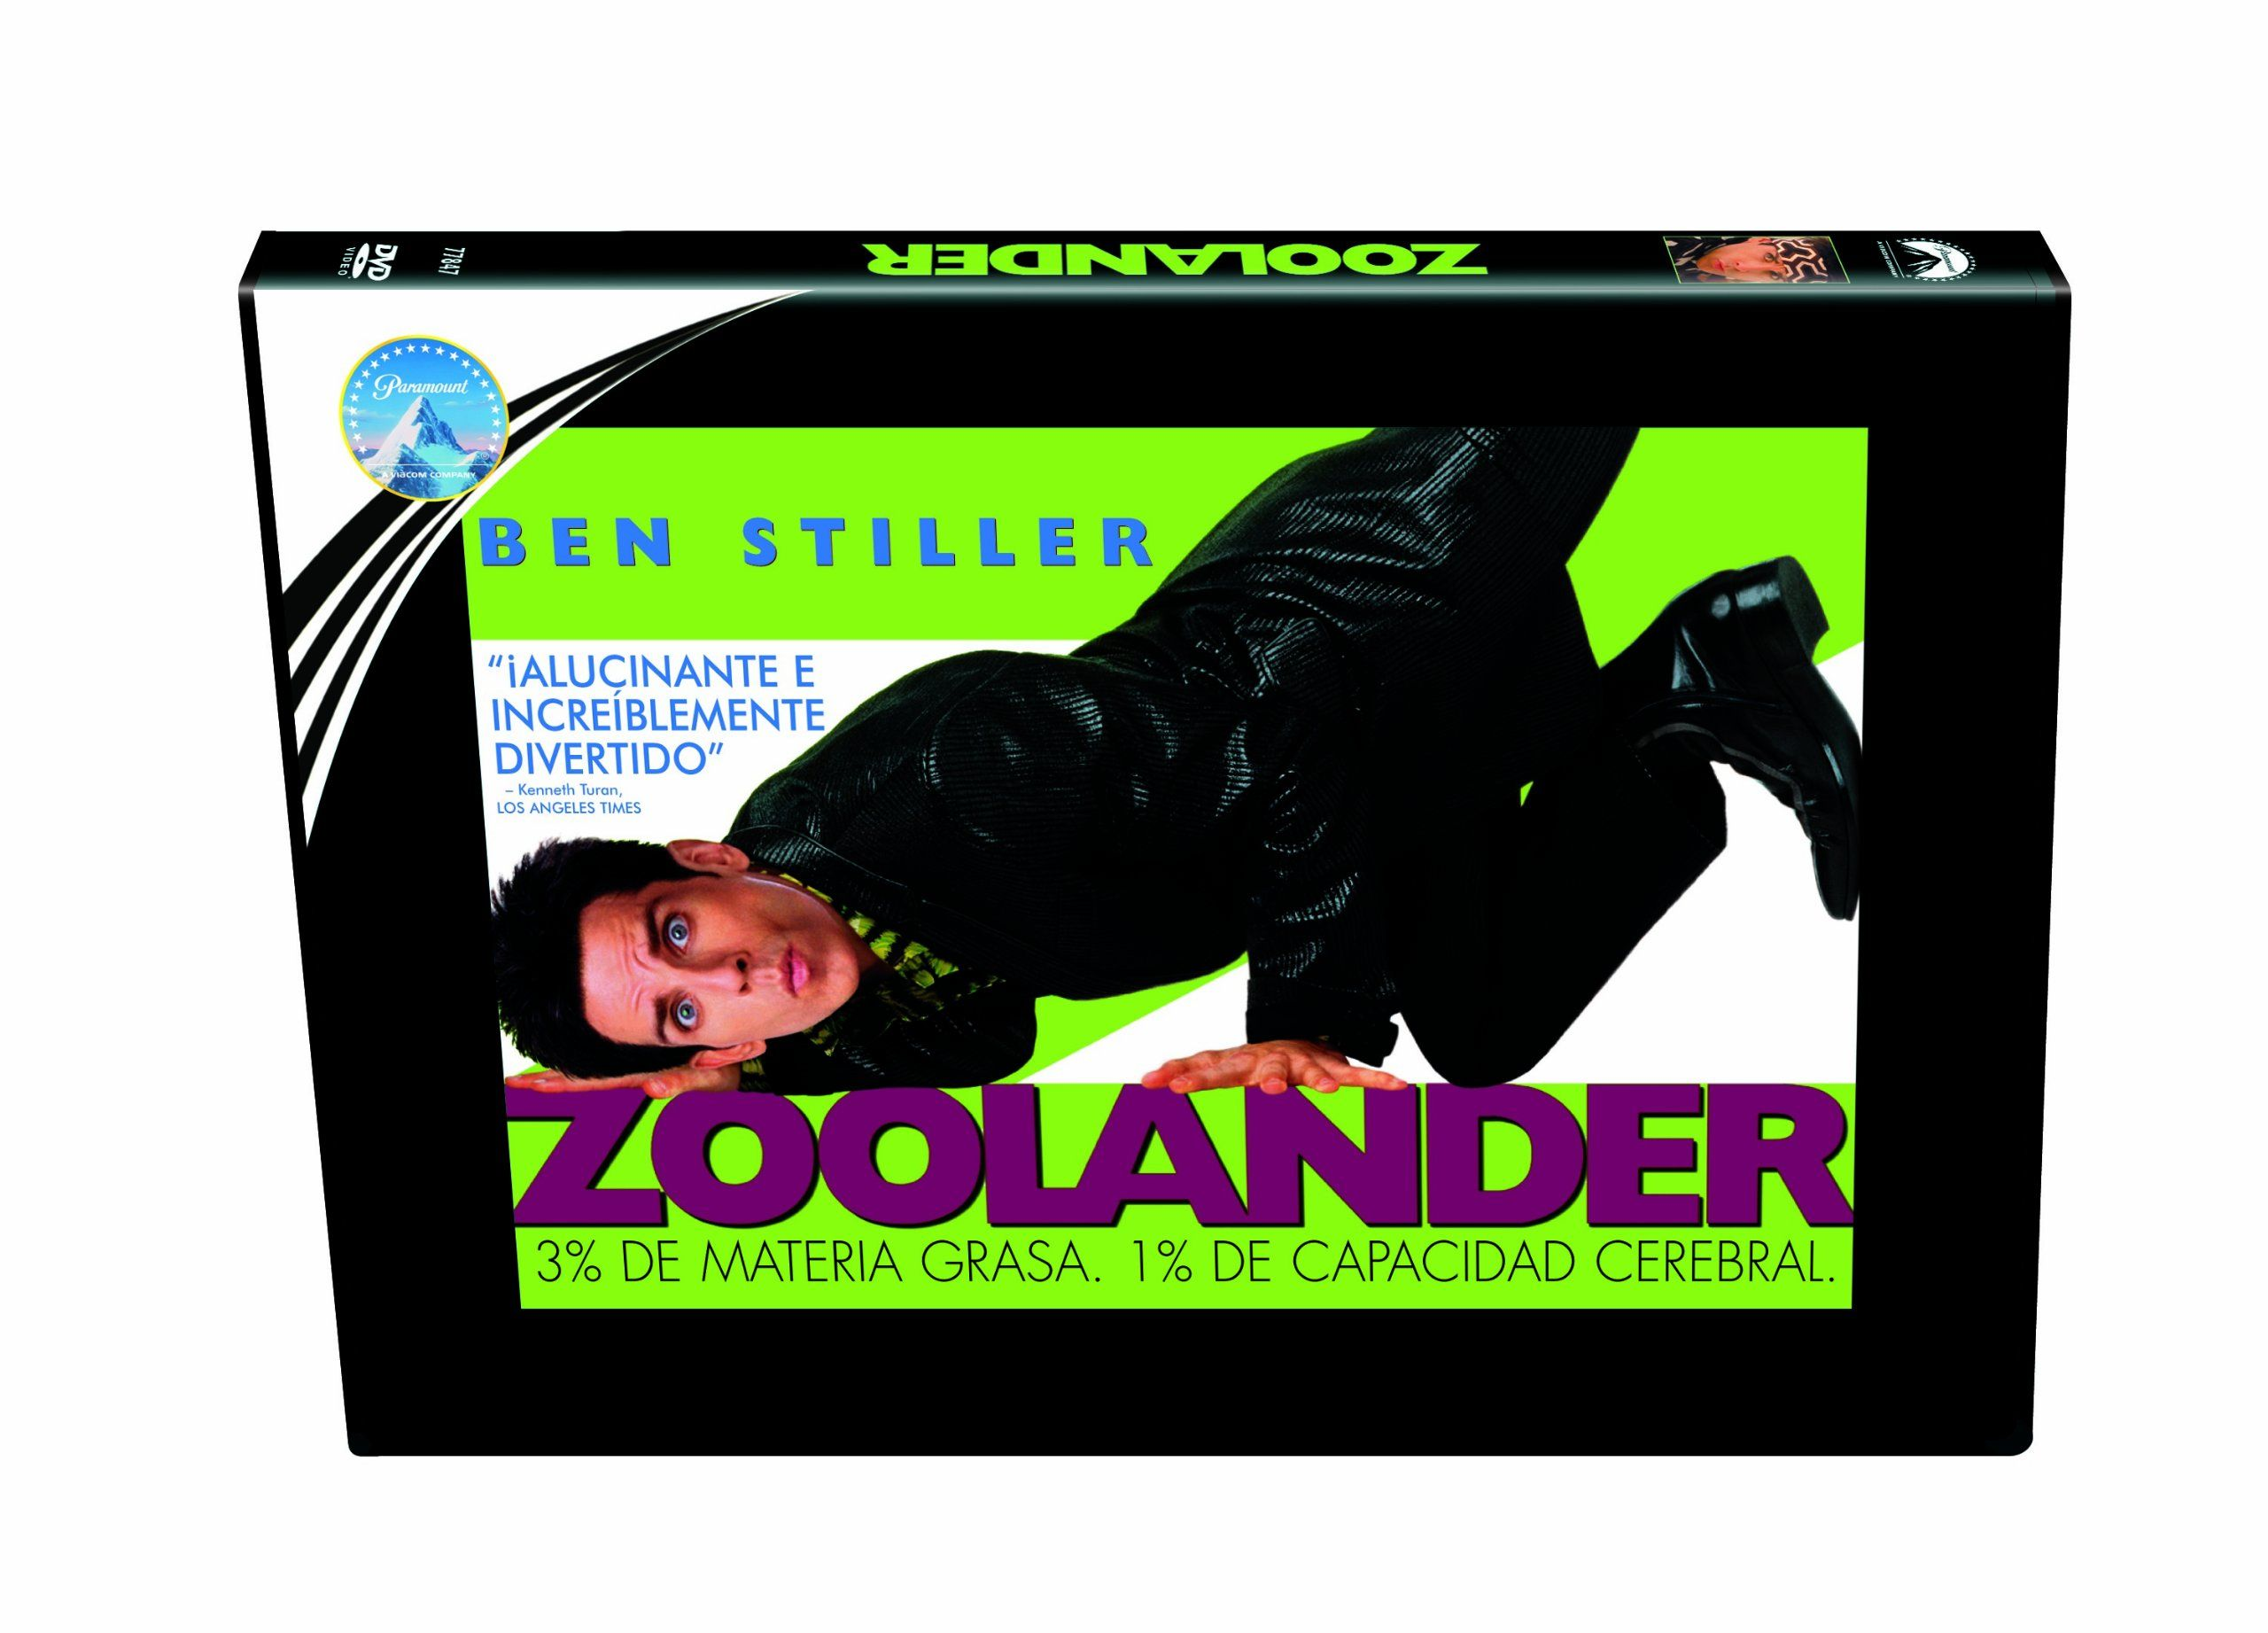 Zoolander (Ed. Horizontal) [DVD] Ed, Zoolander, DVD,